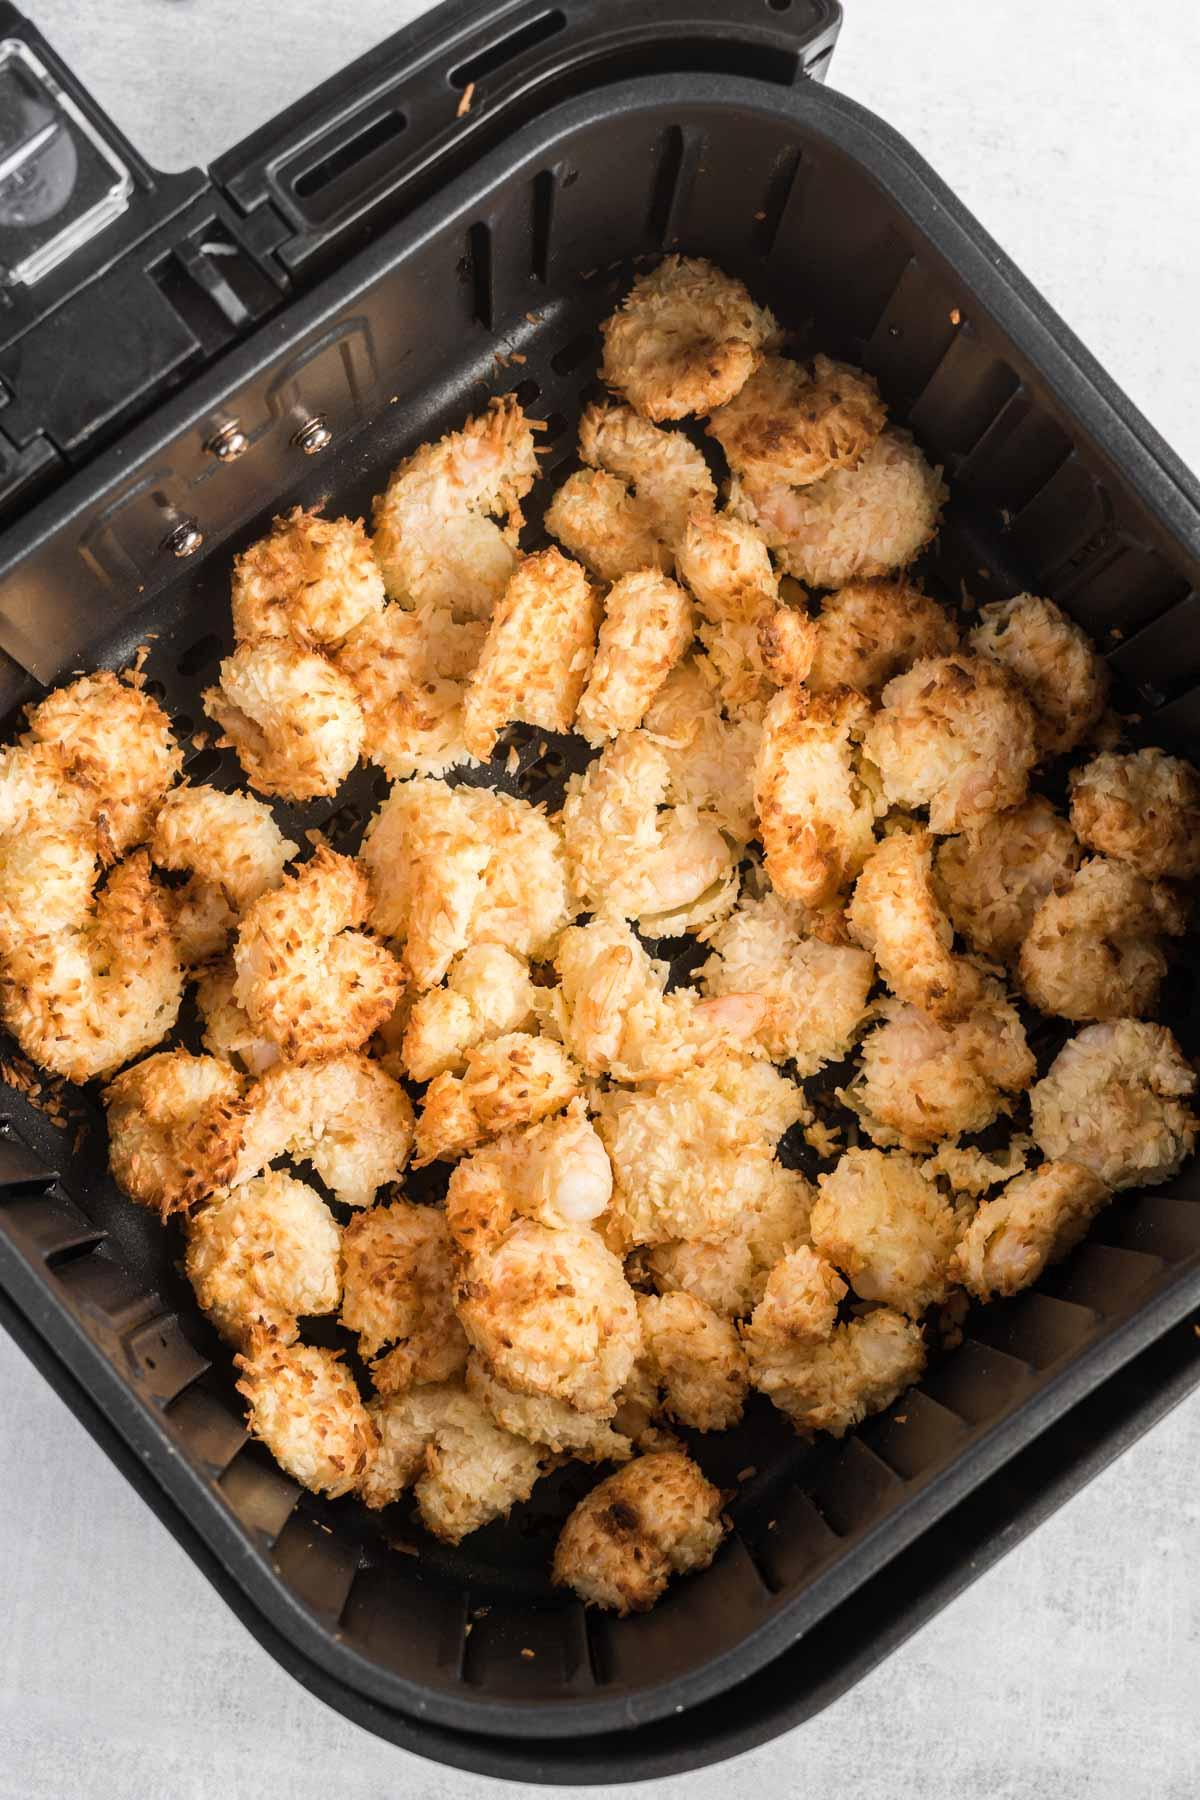 Air fried coconut shrimp in an air fryer basket.